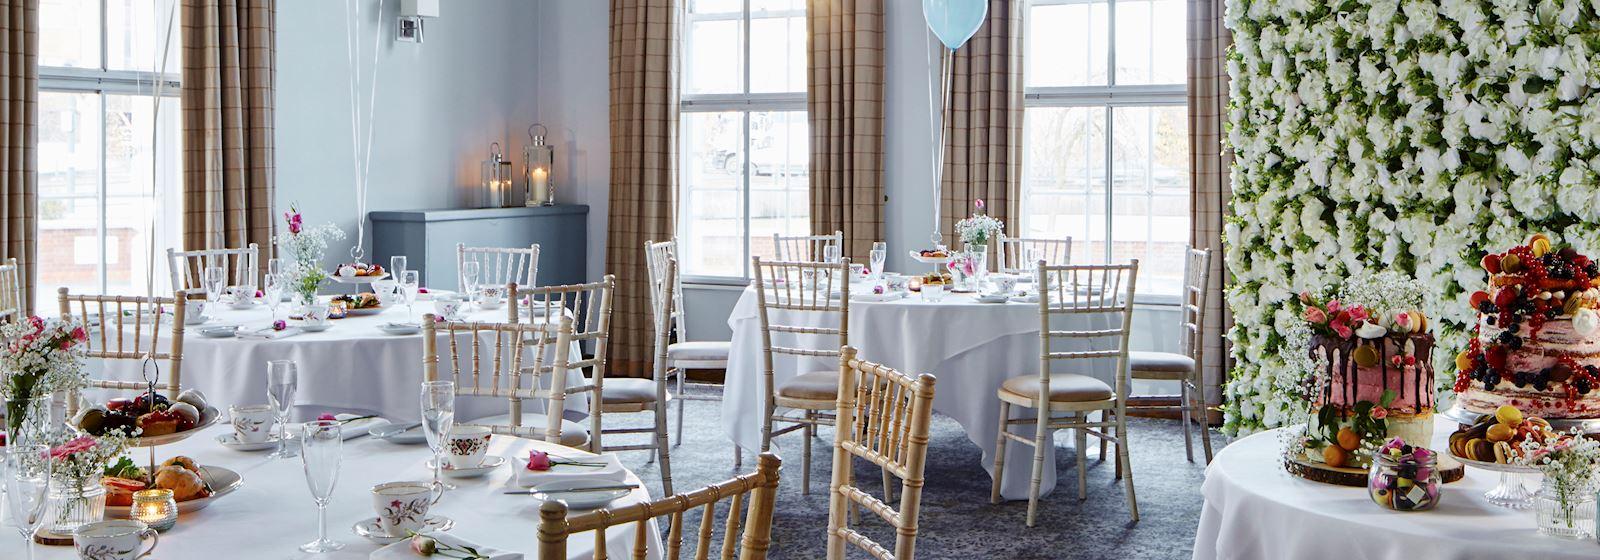 Birmingham Marriott Hotel Special Occasions